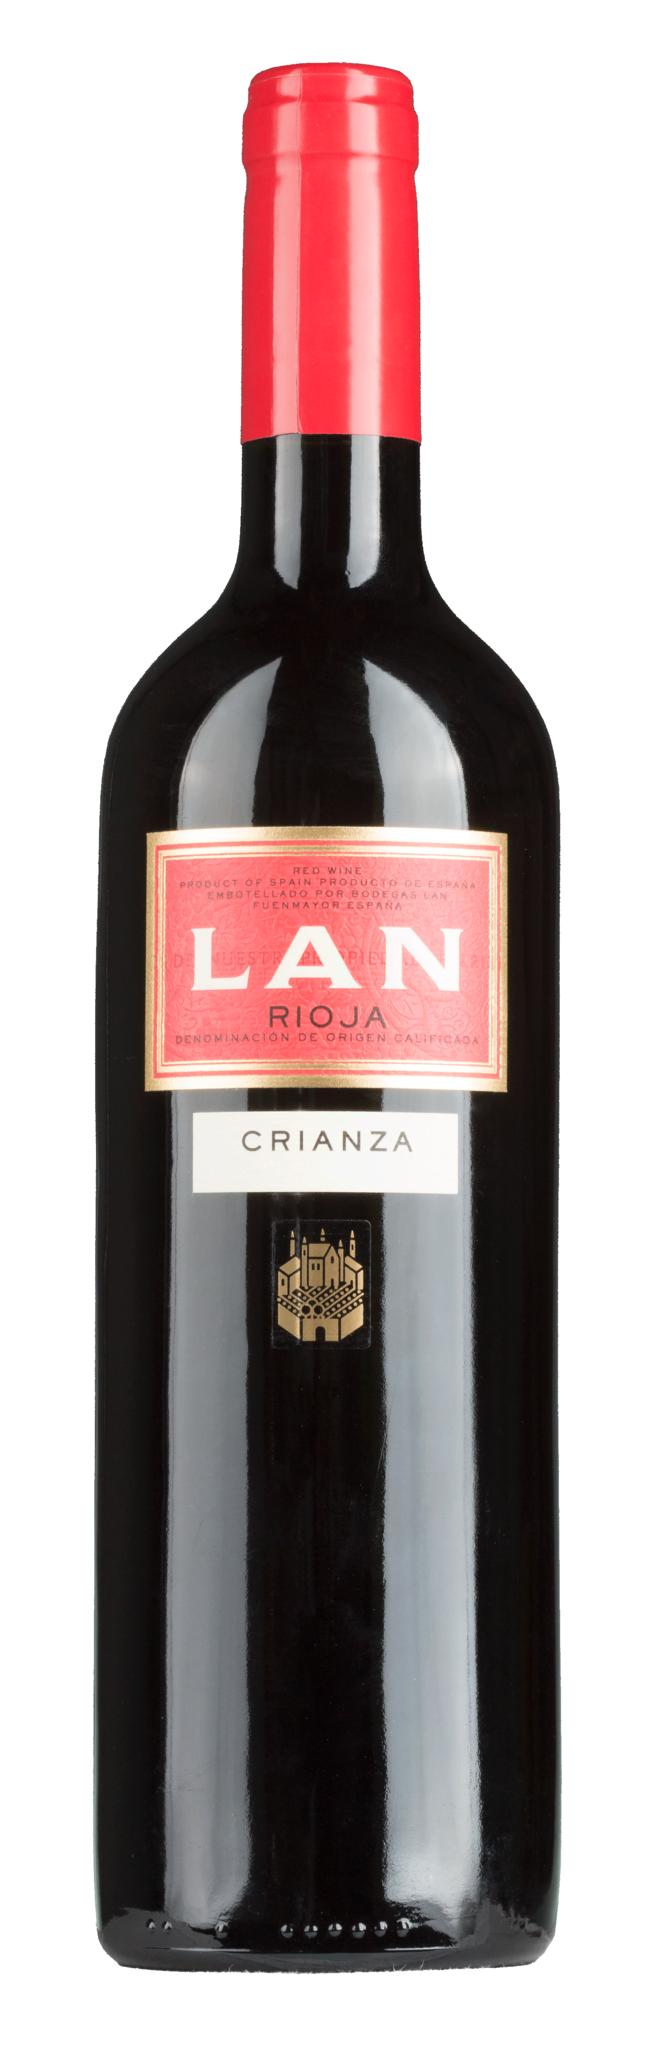 Lan, Bodegas - Rioja 2017 Rioja Crianza, Bodegas Lan